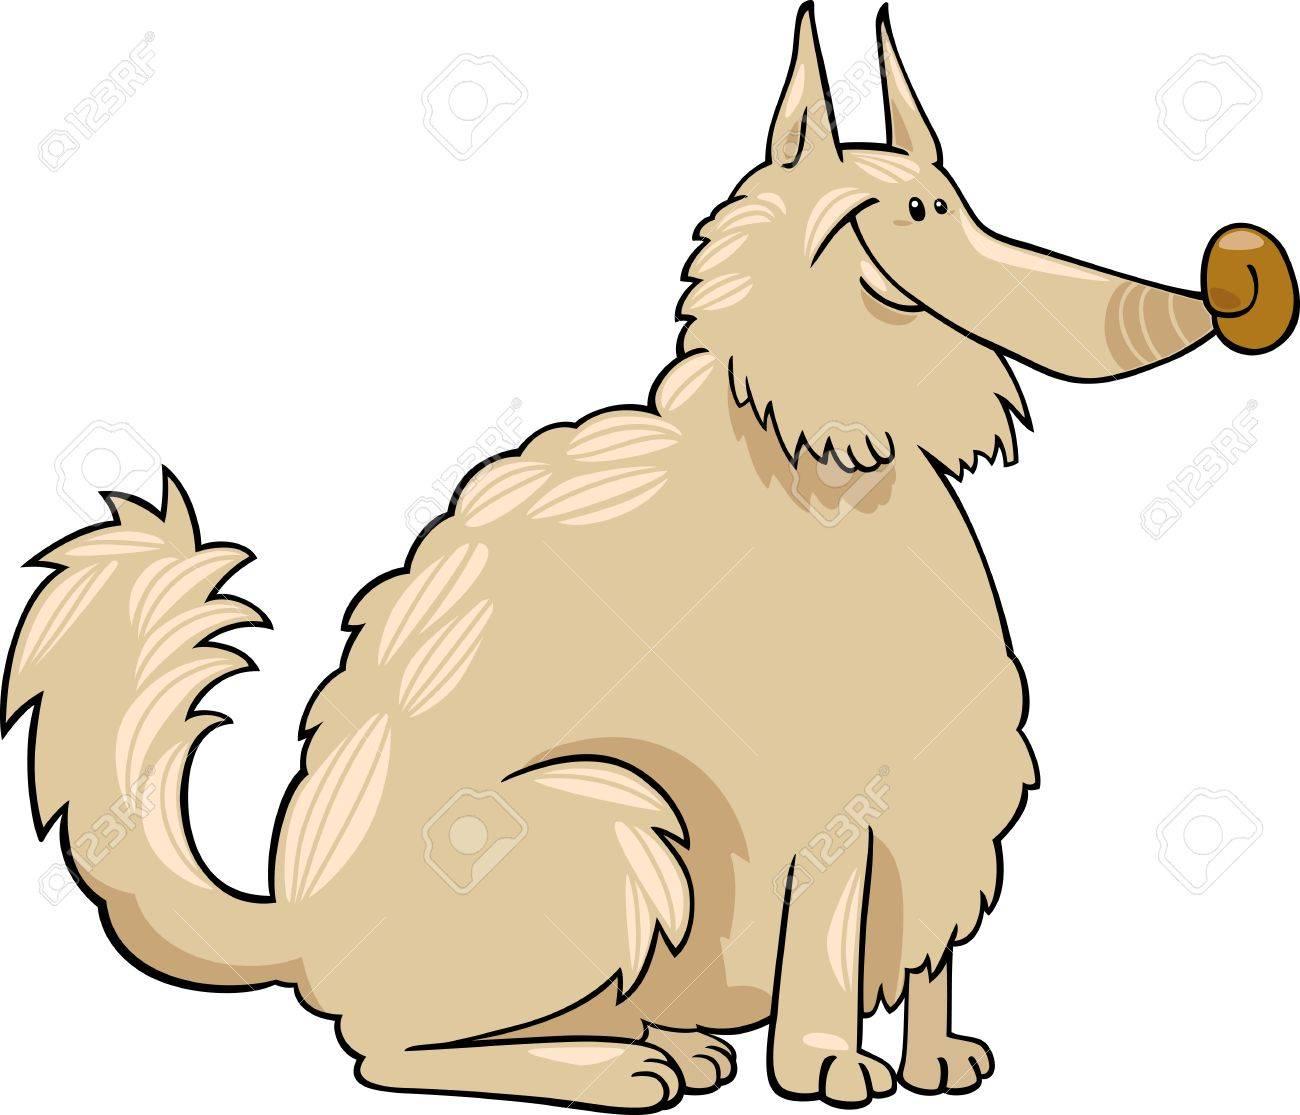 Cartoon Illustration of Shaggy Purebred Eskimo Dog or Spitz or Sheepdog Stock Vector - 17087918